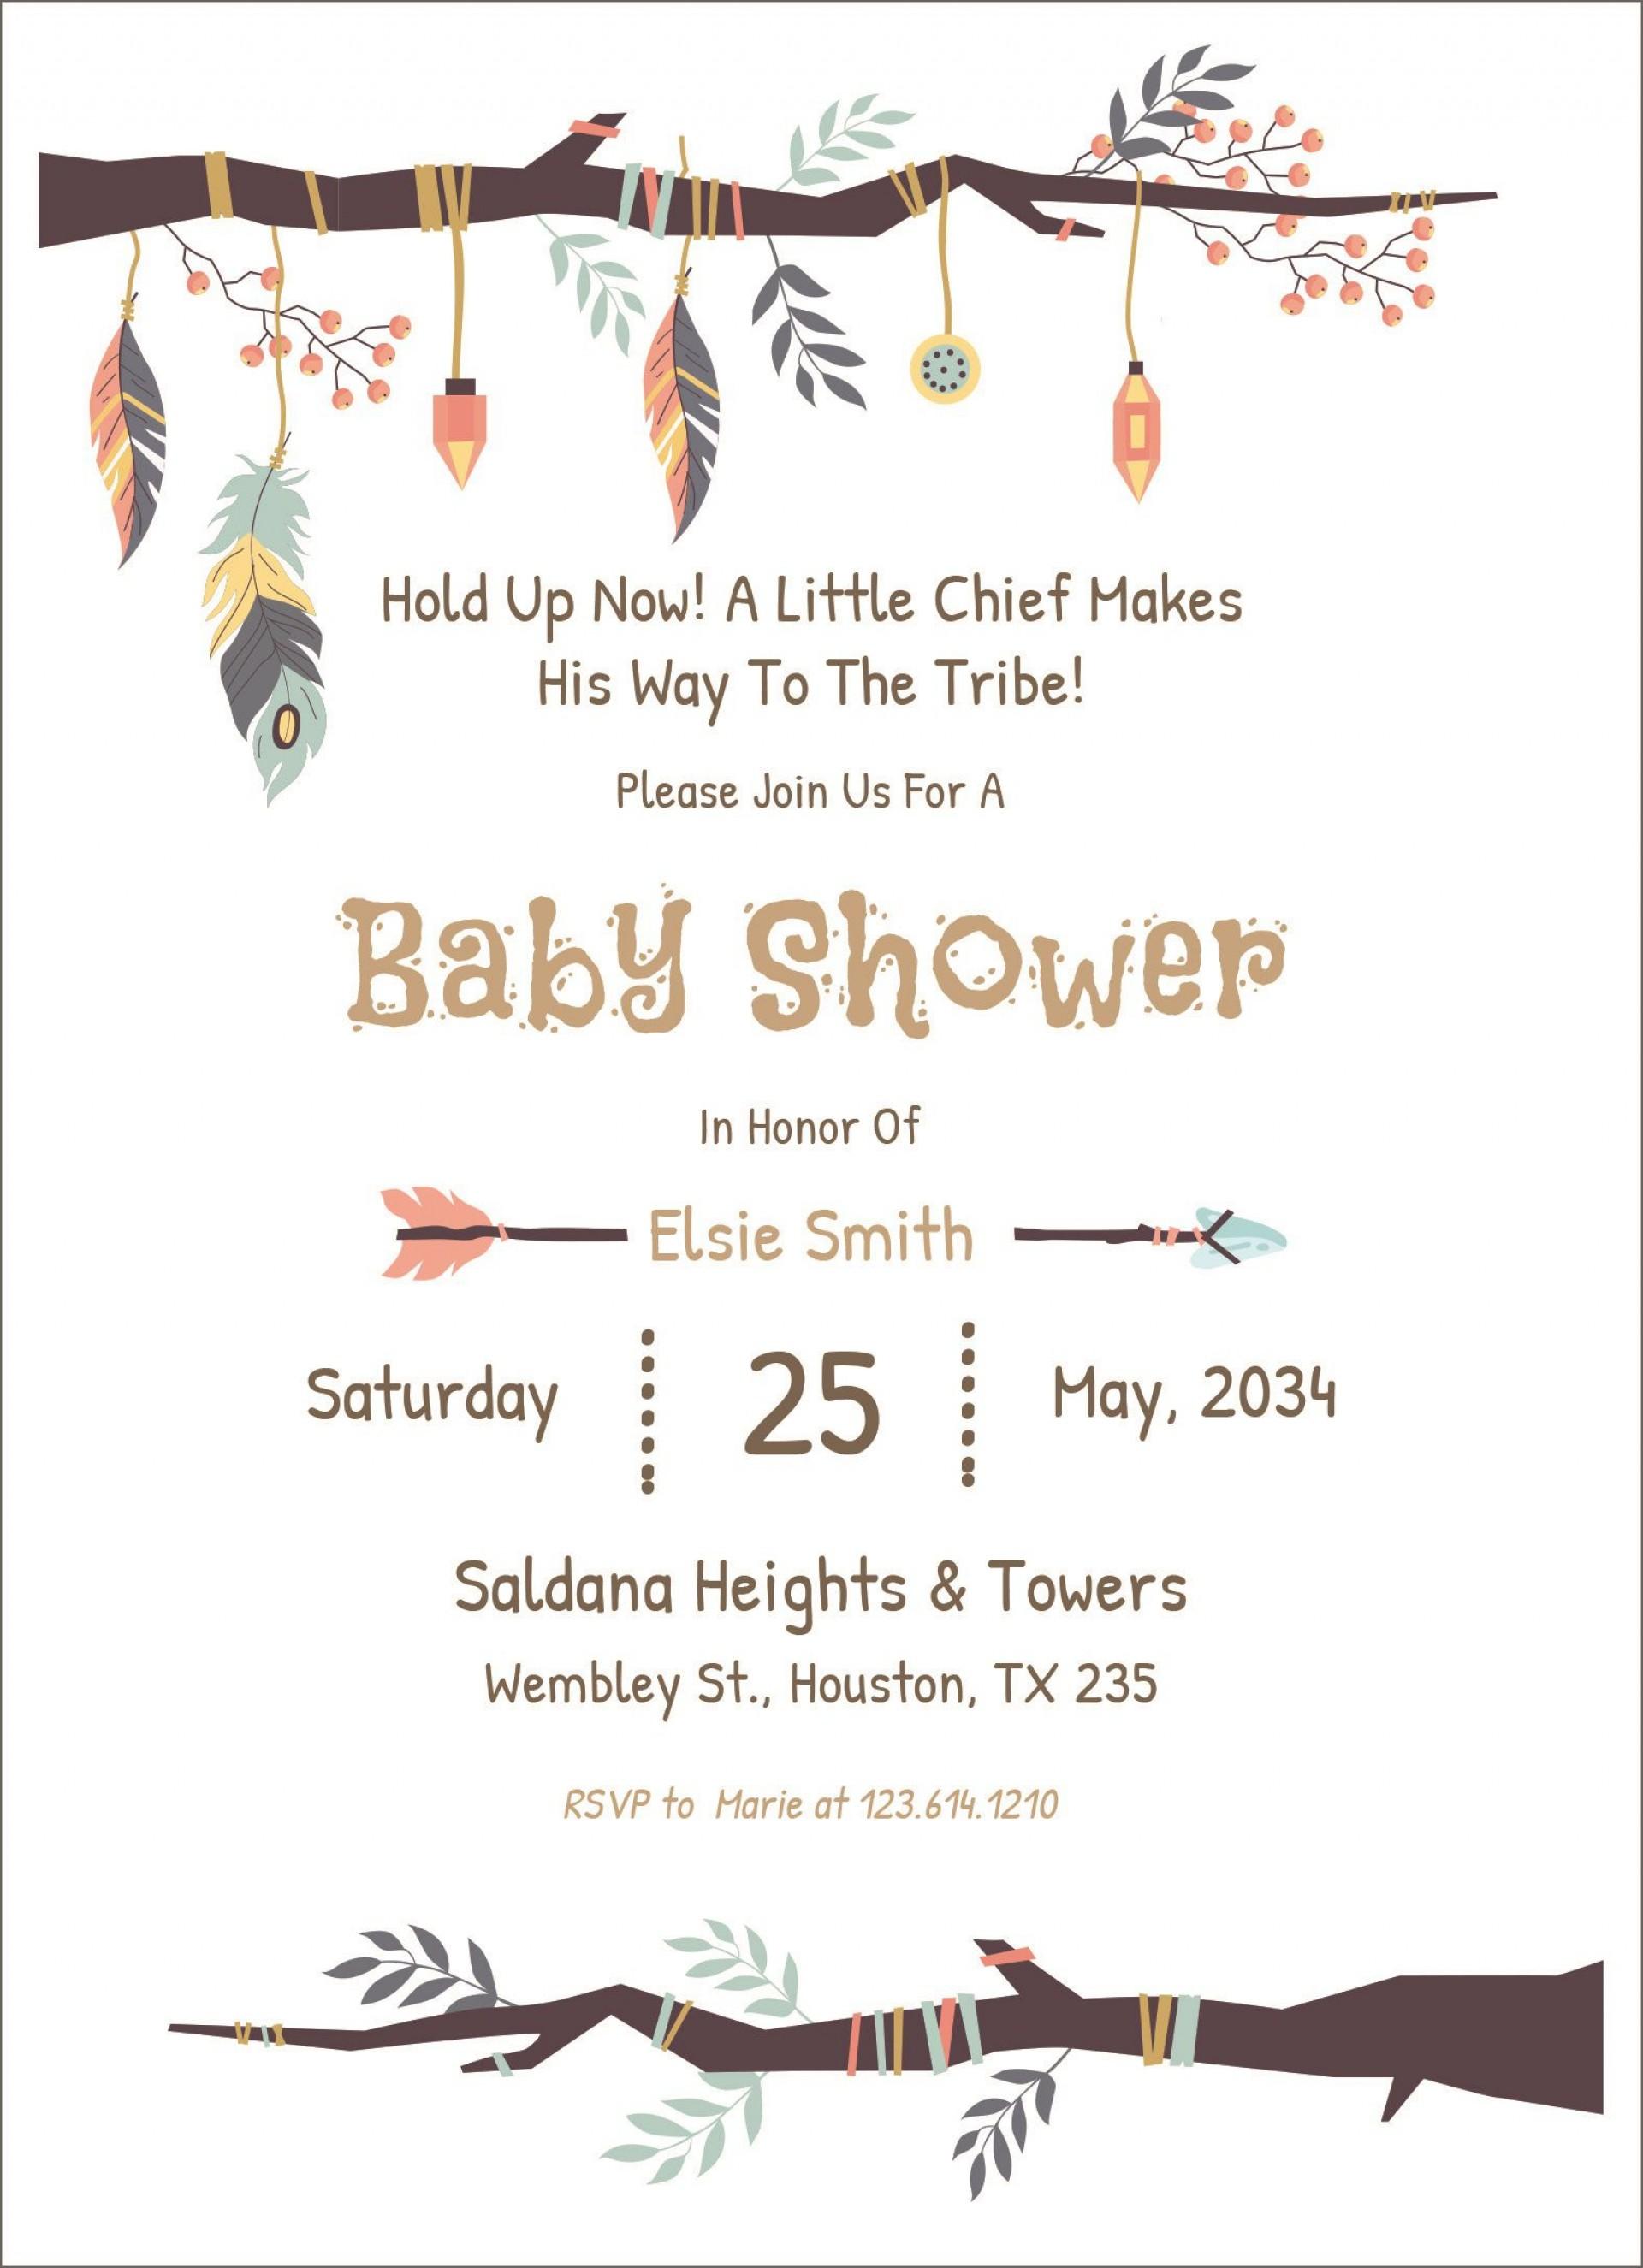 002 Wondrou Baby Shower Invitation Free Template Design  Templates Online Printable E-invitation Card Download1920